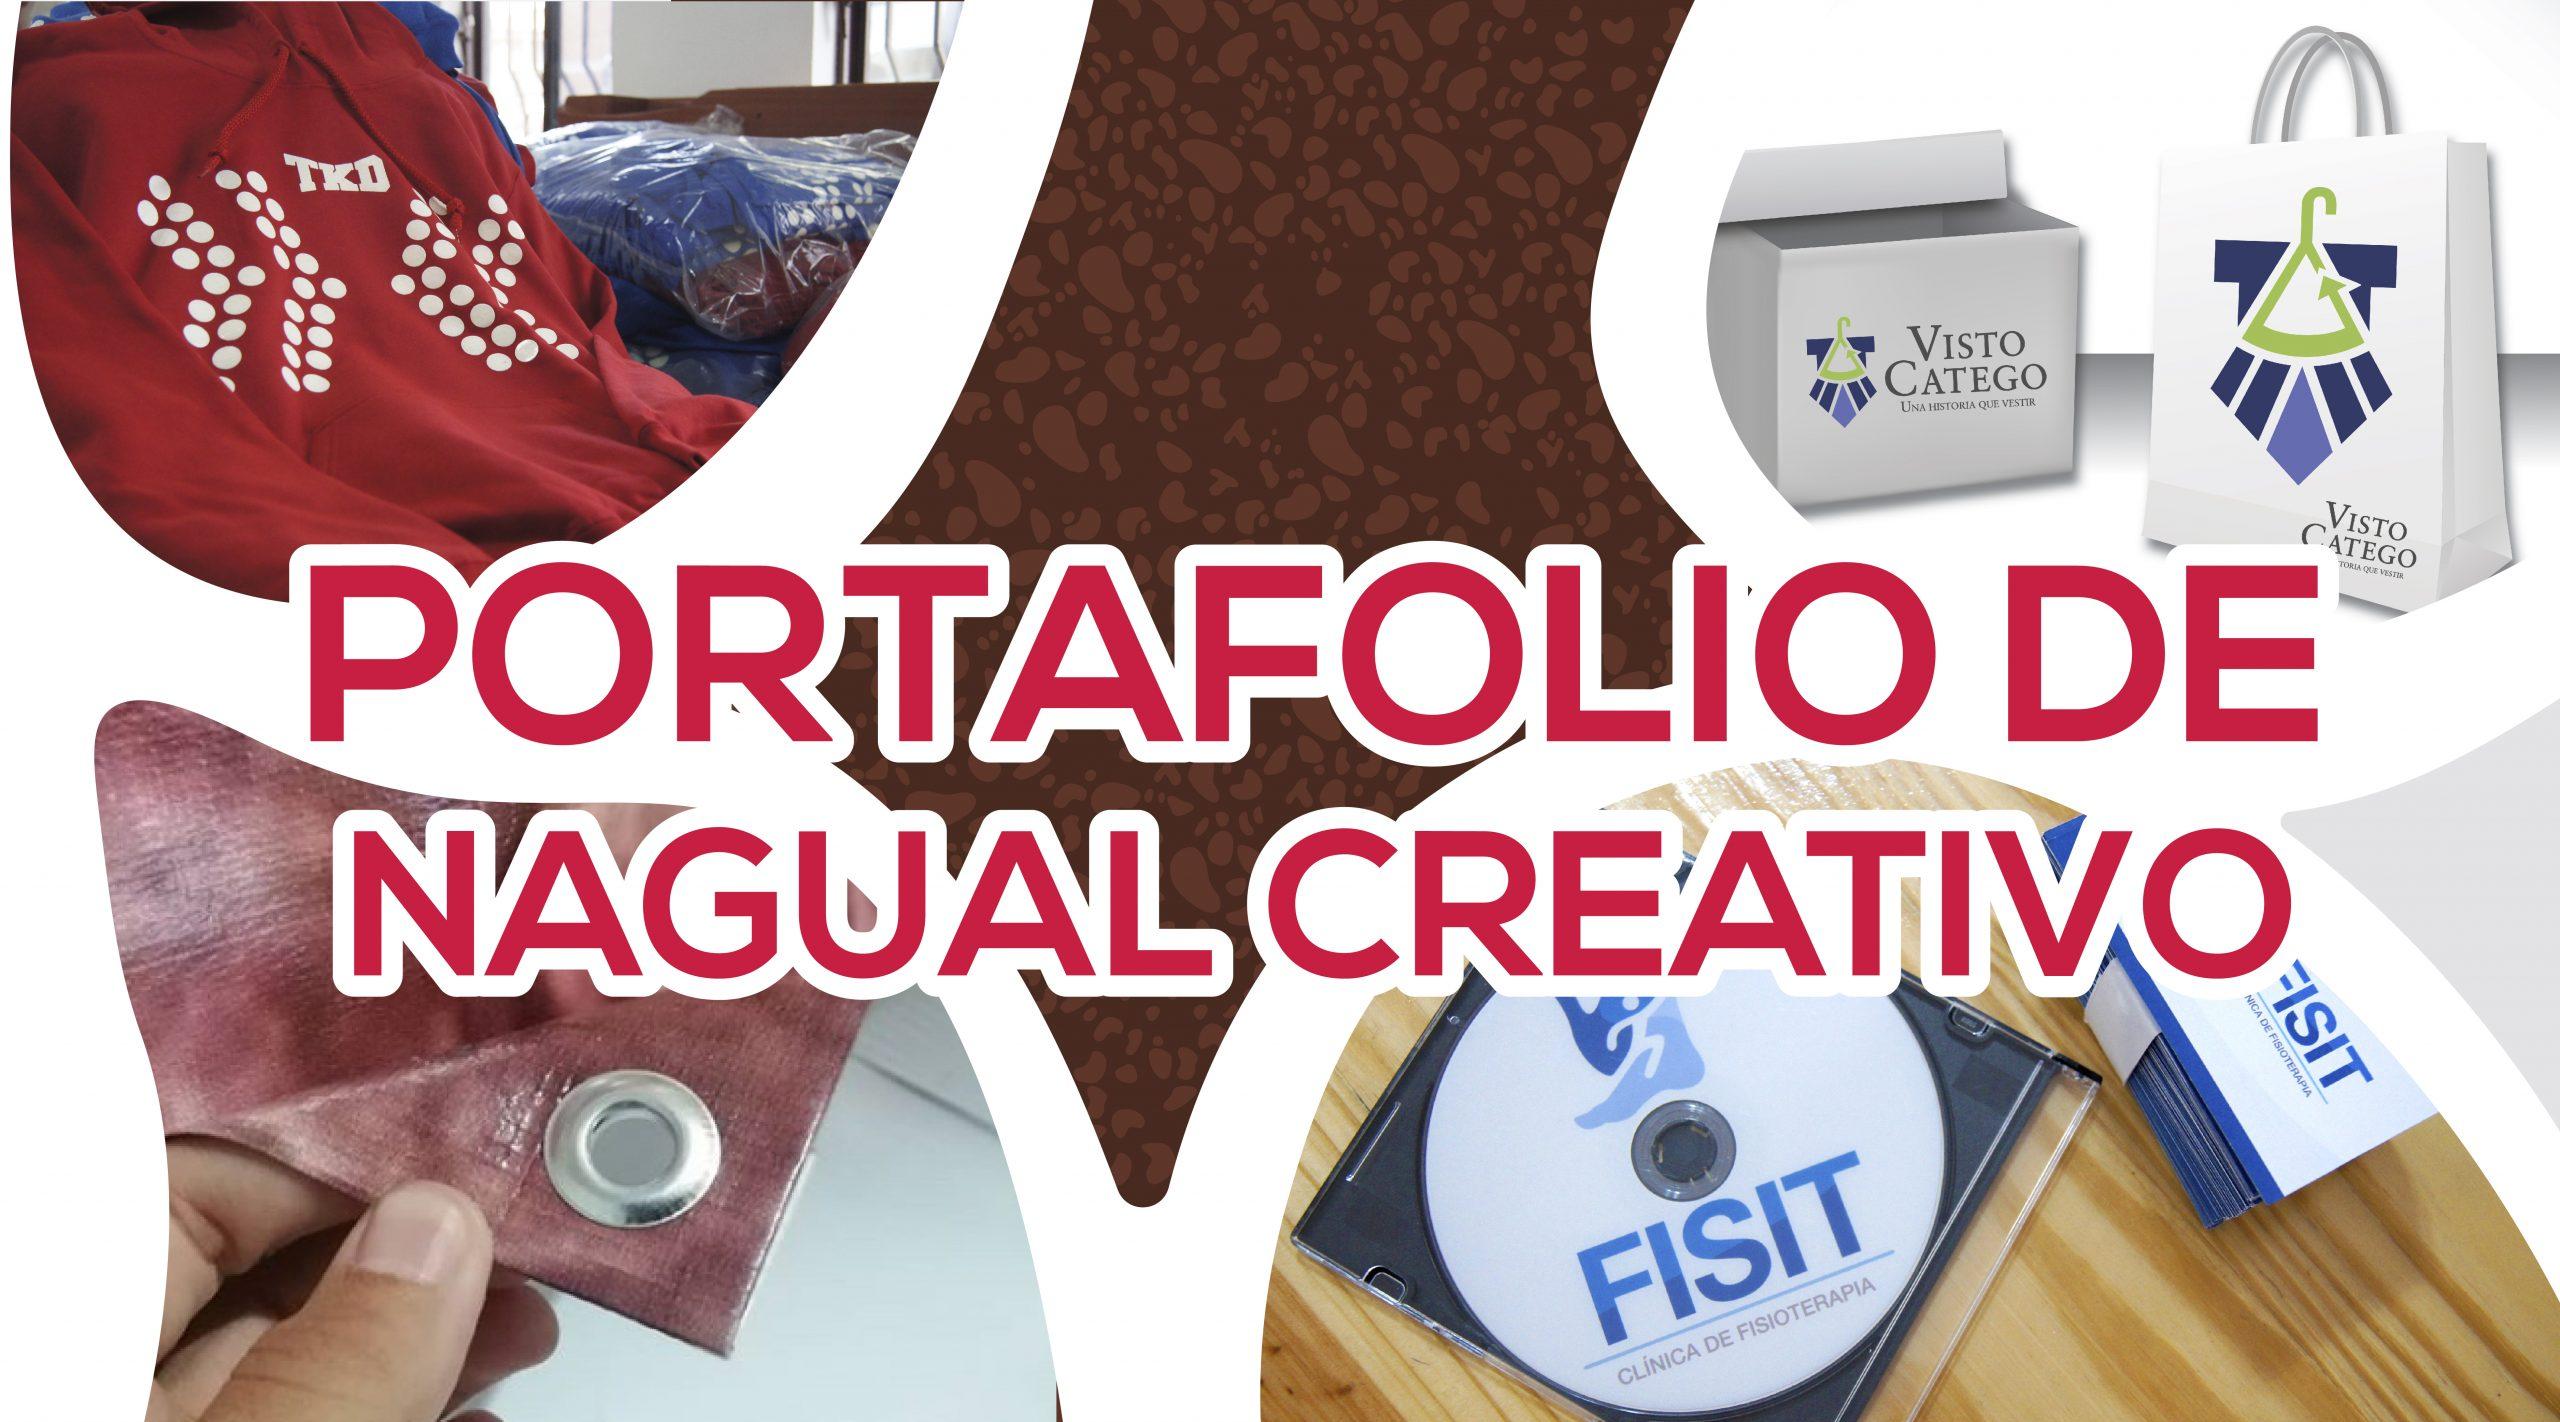 PORTAFOLIO - NAGUAL CREATIVO